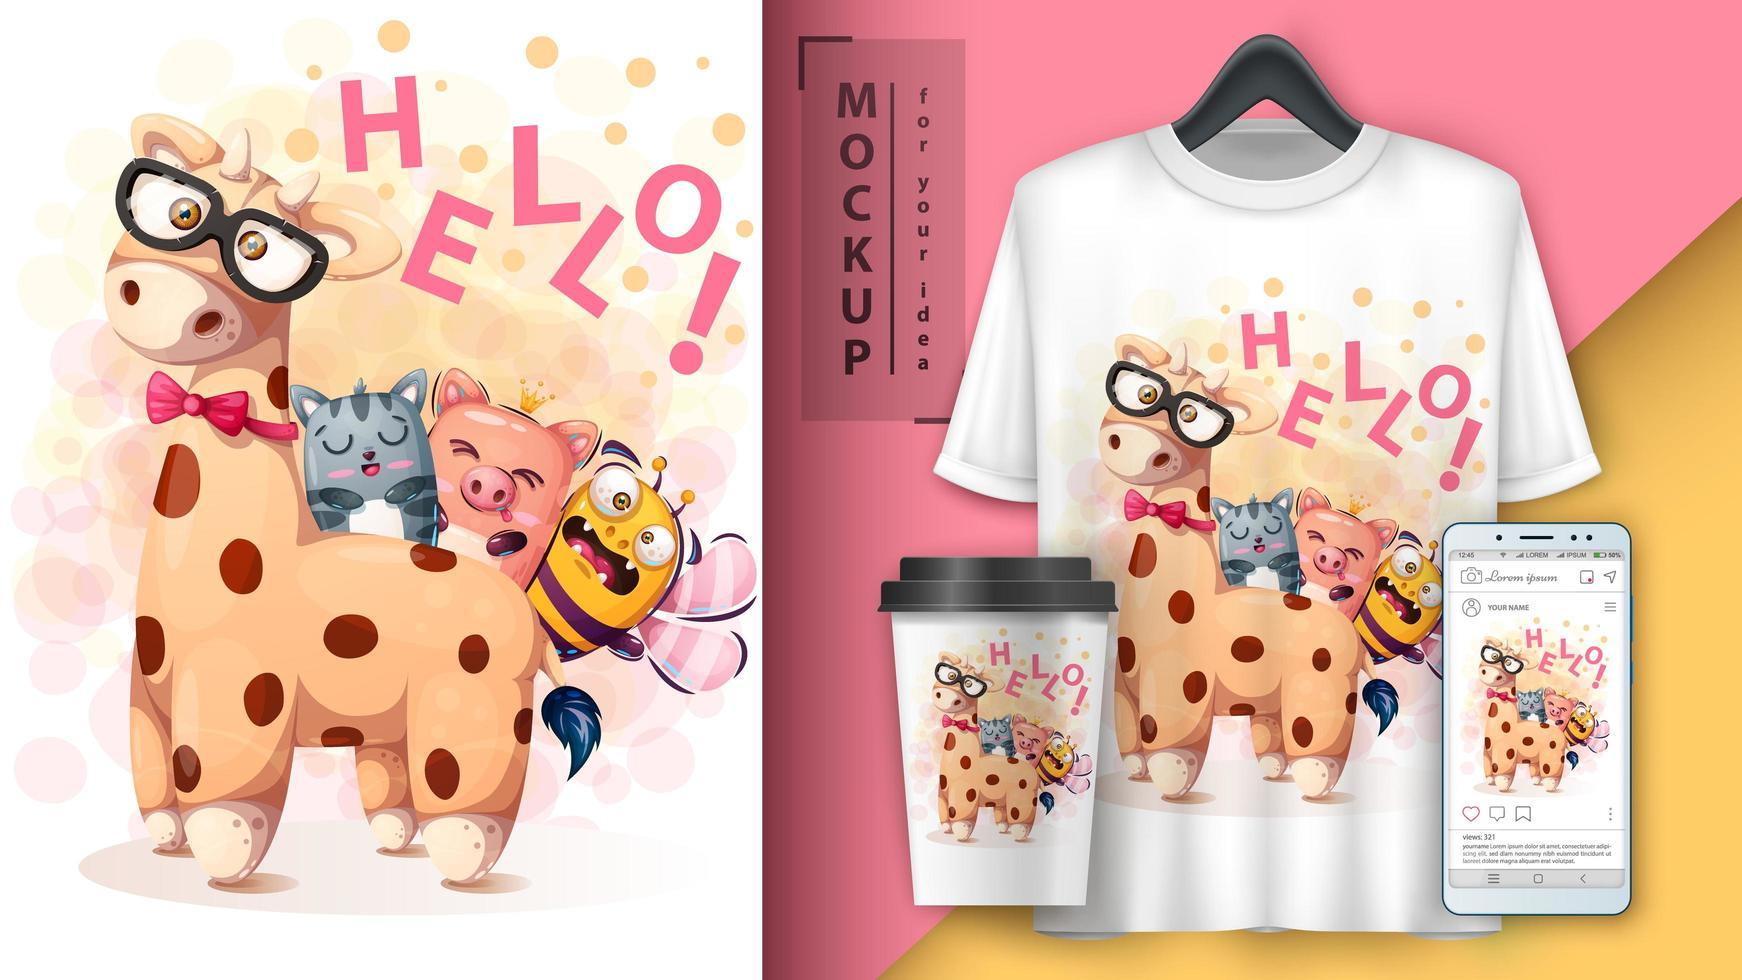 Hallo Freunde Cartoon Giraffe Poster vektor